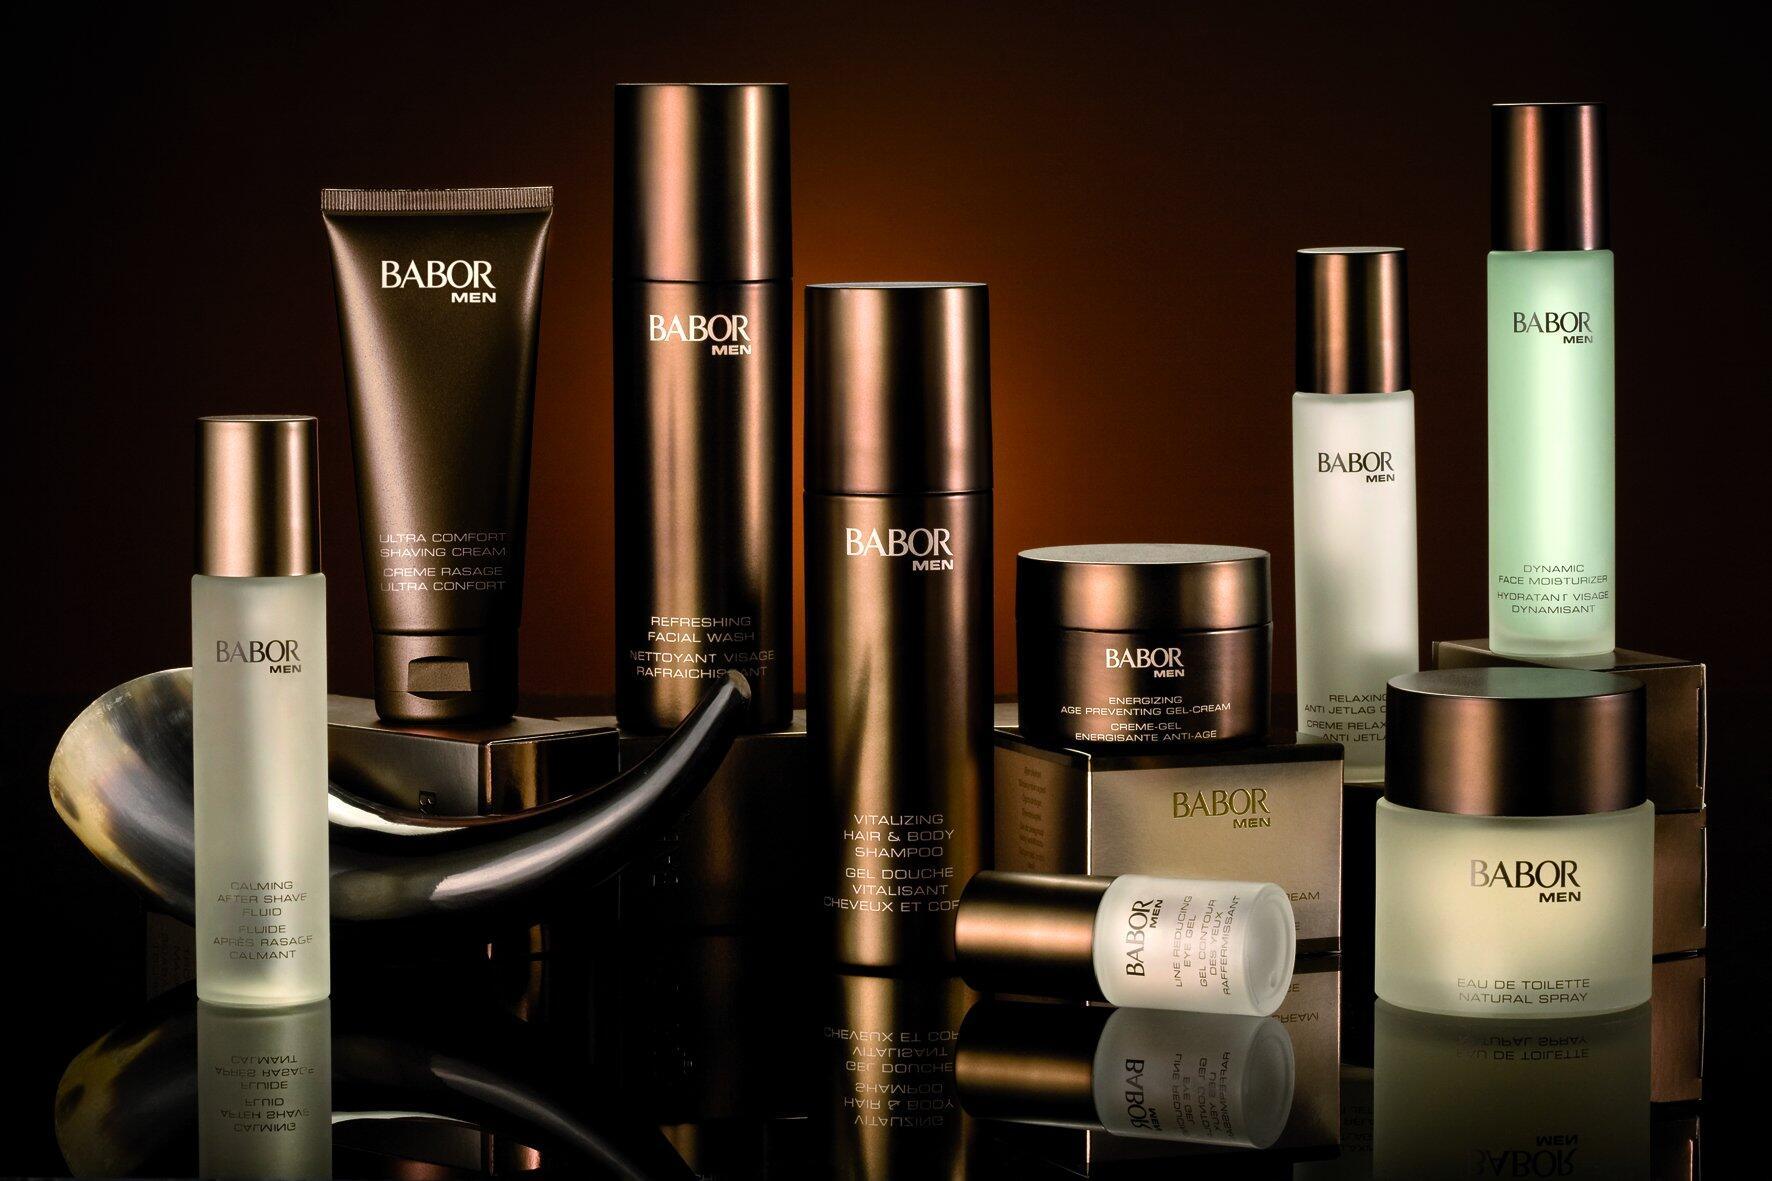 Бабор косметика официальный сайт купить москва cherish avon perfume